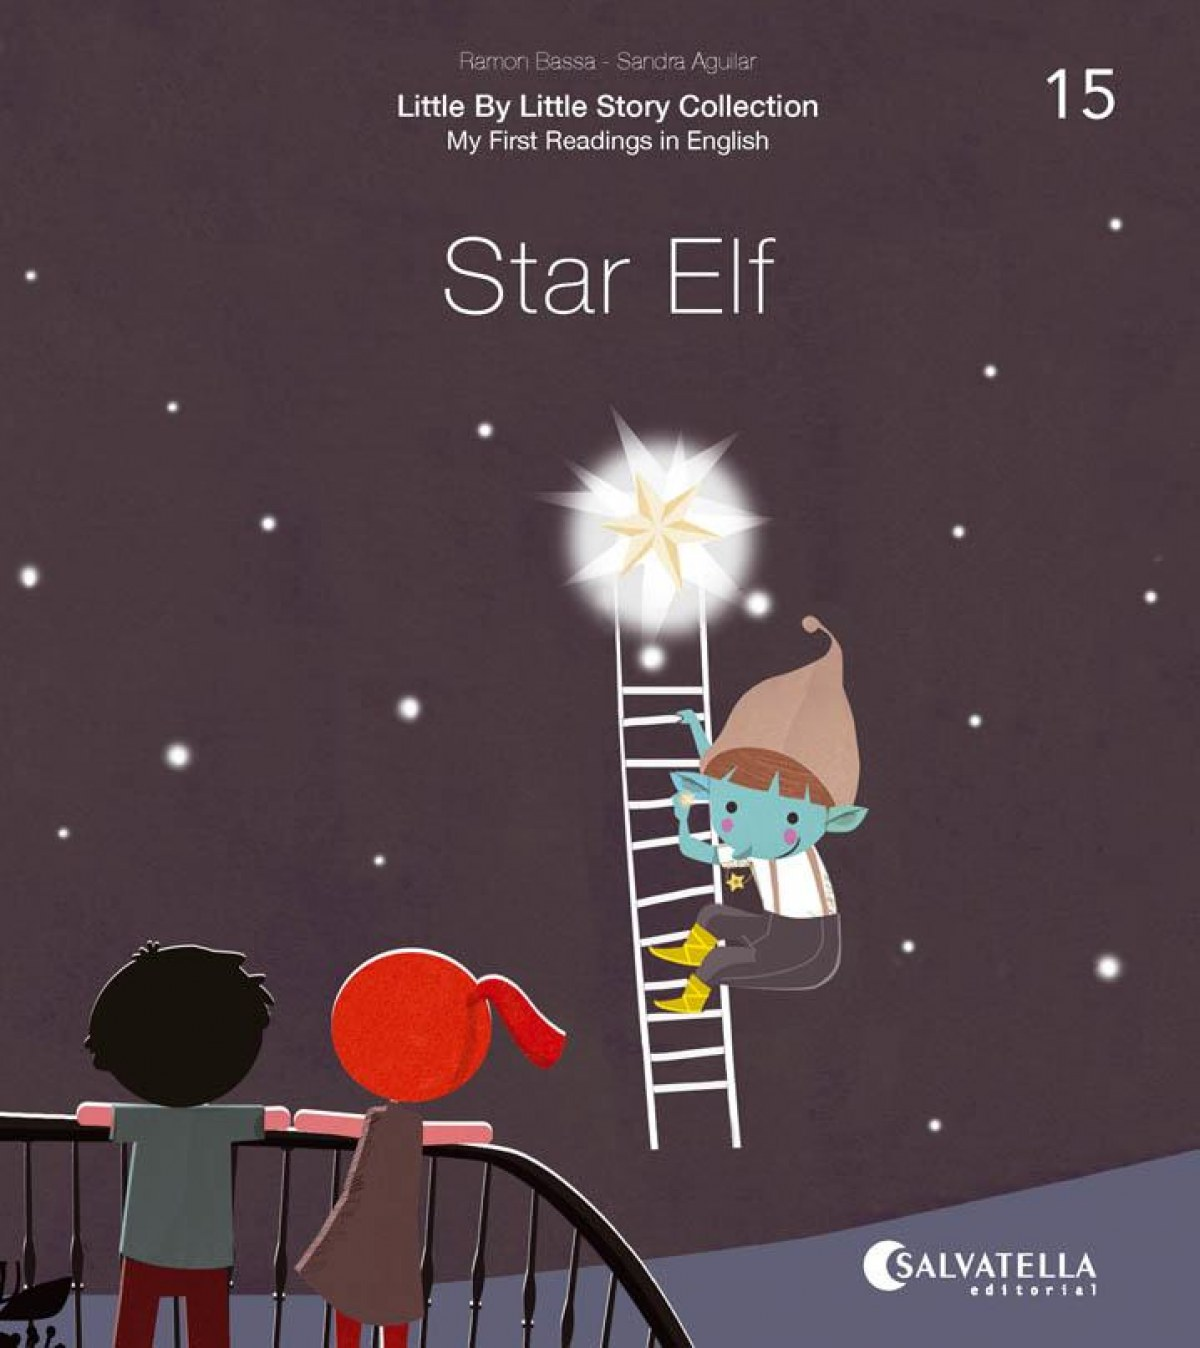 Star Elf